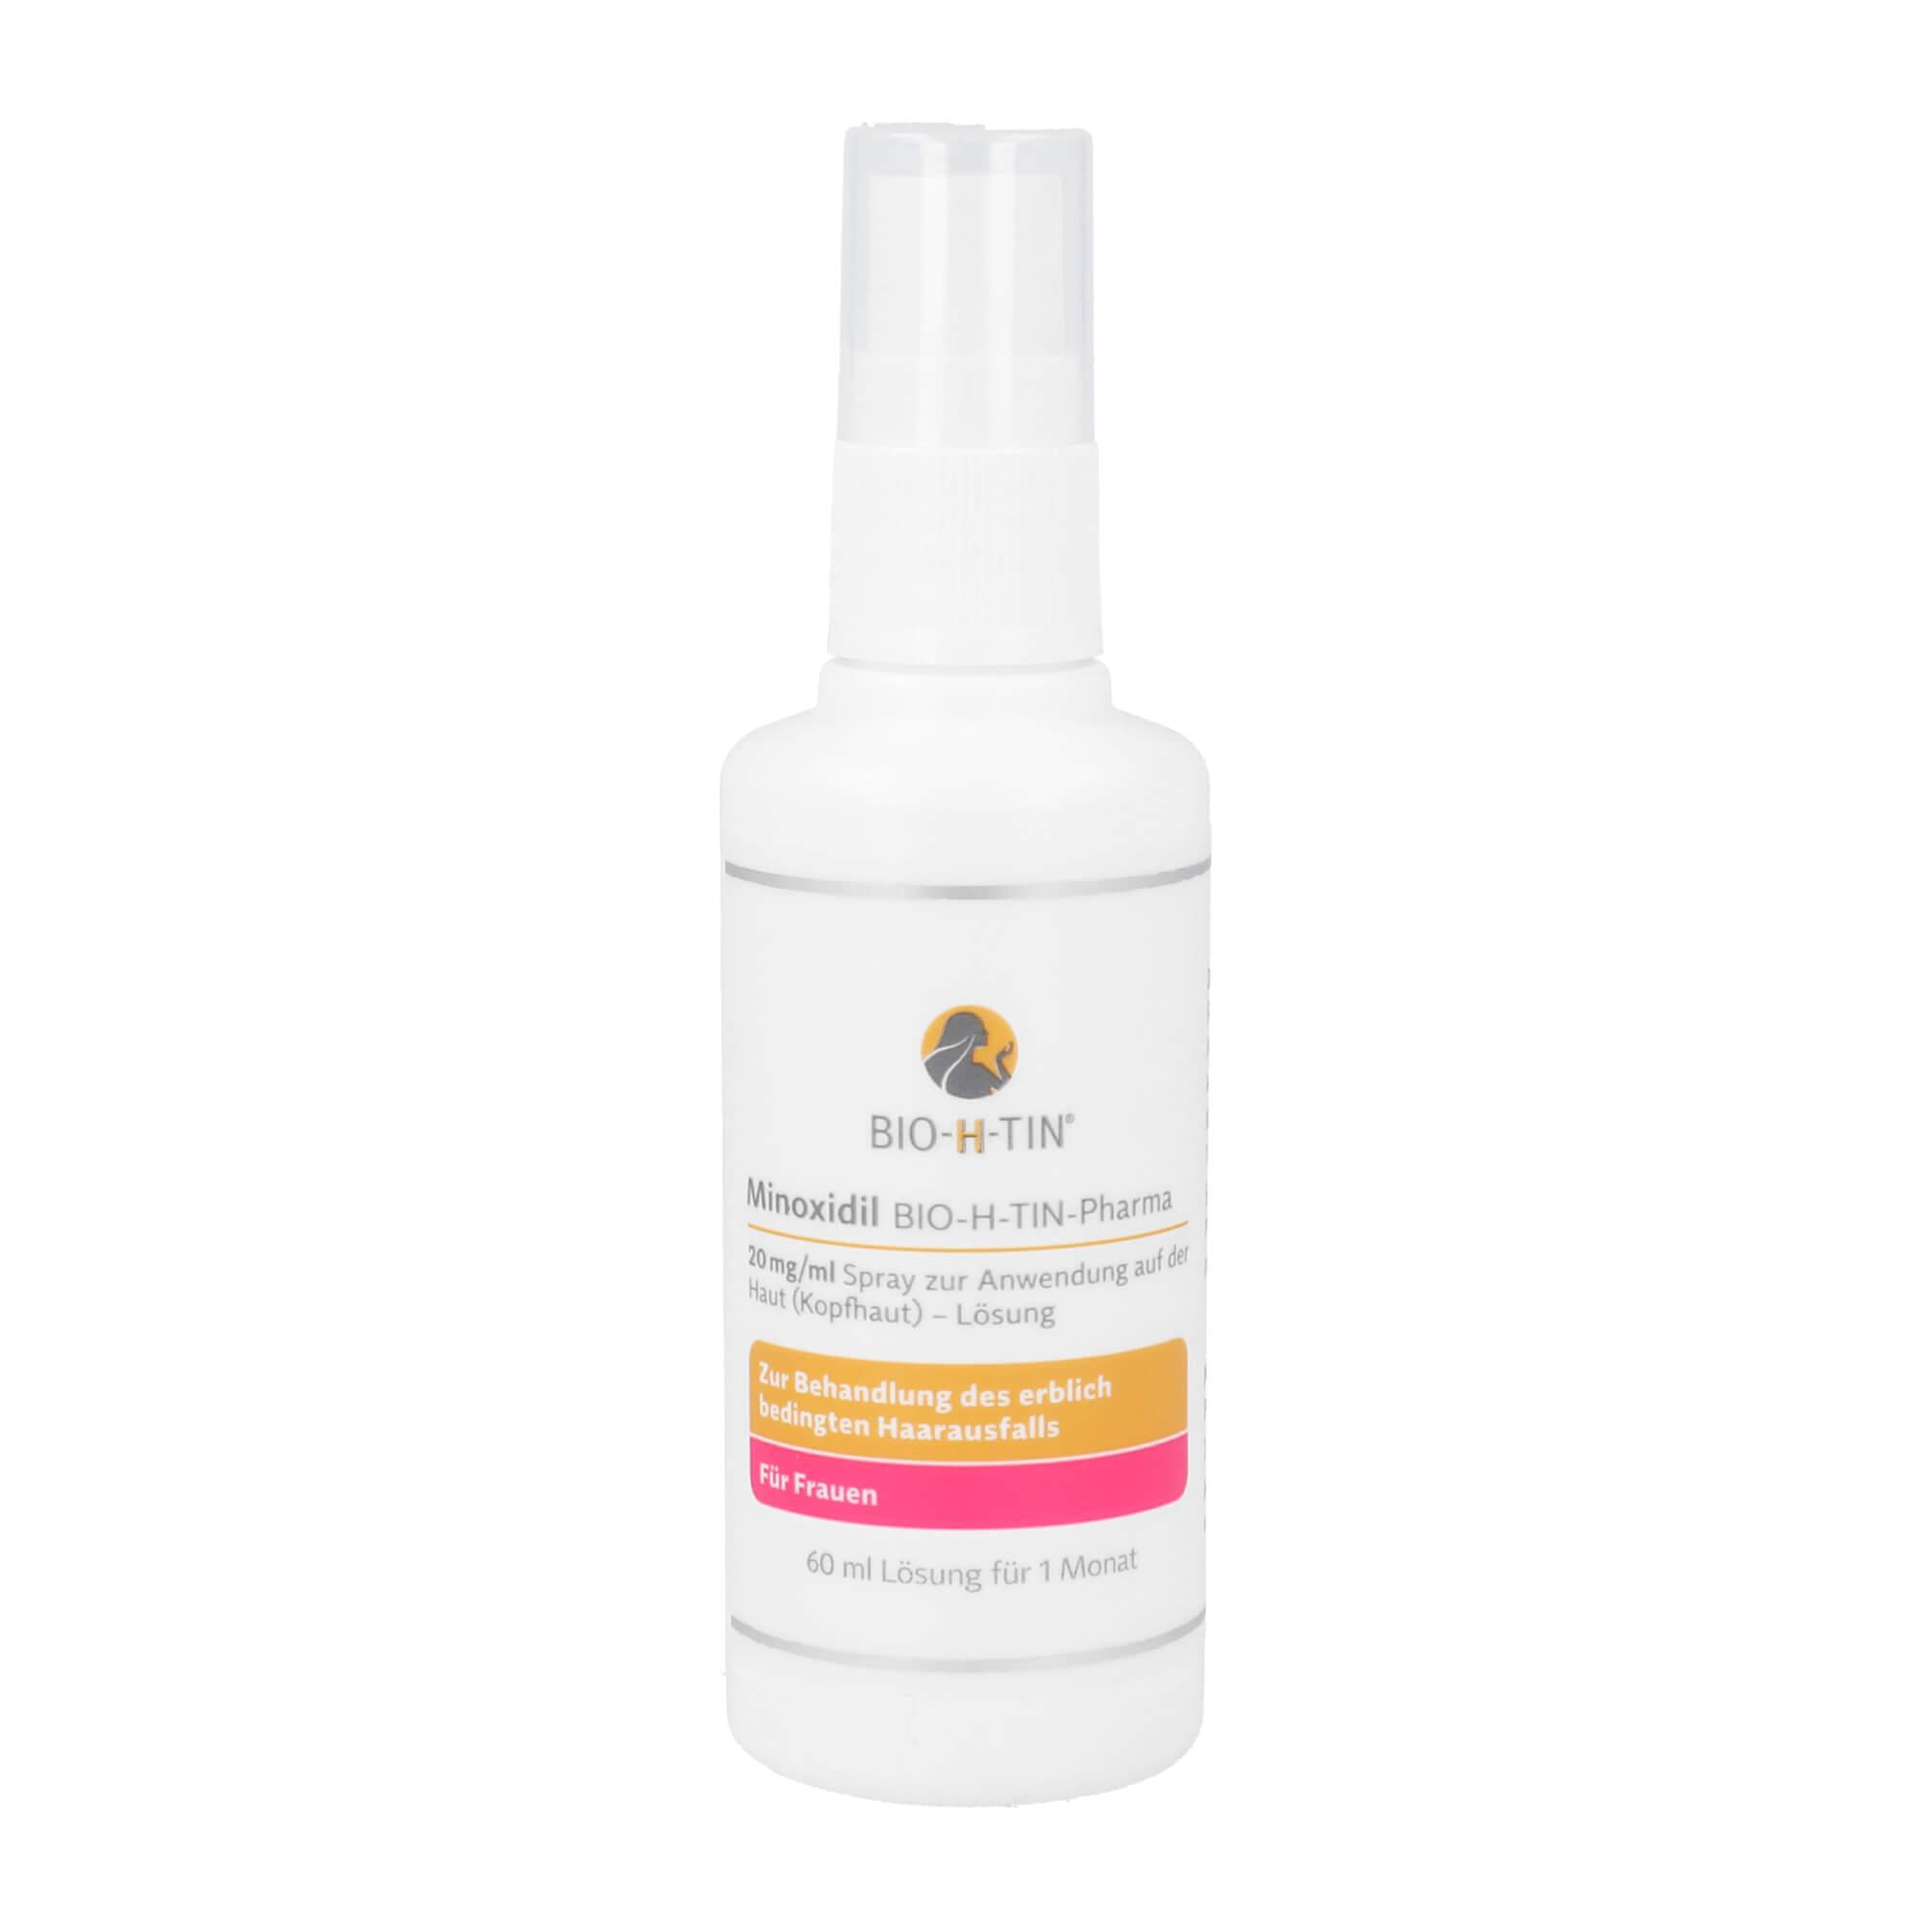 Minoxidil BIO-H-TIN-Pharma 20mg/ml Frauen